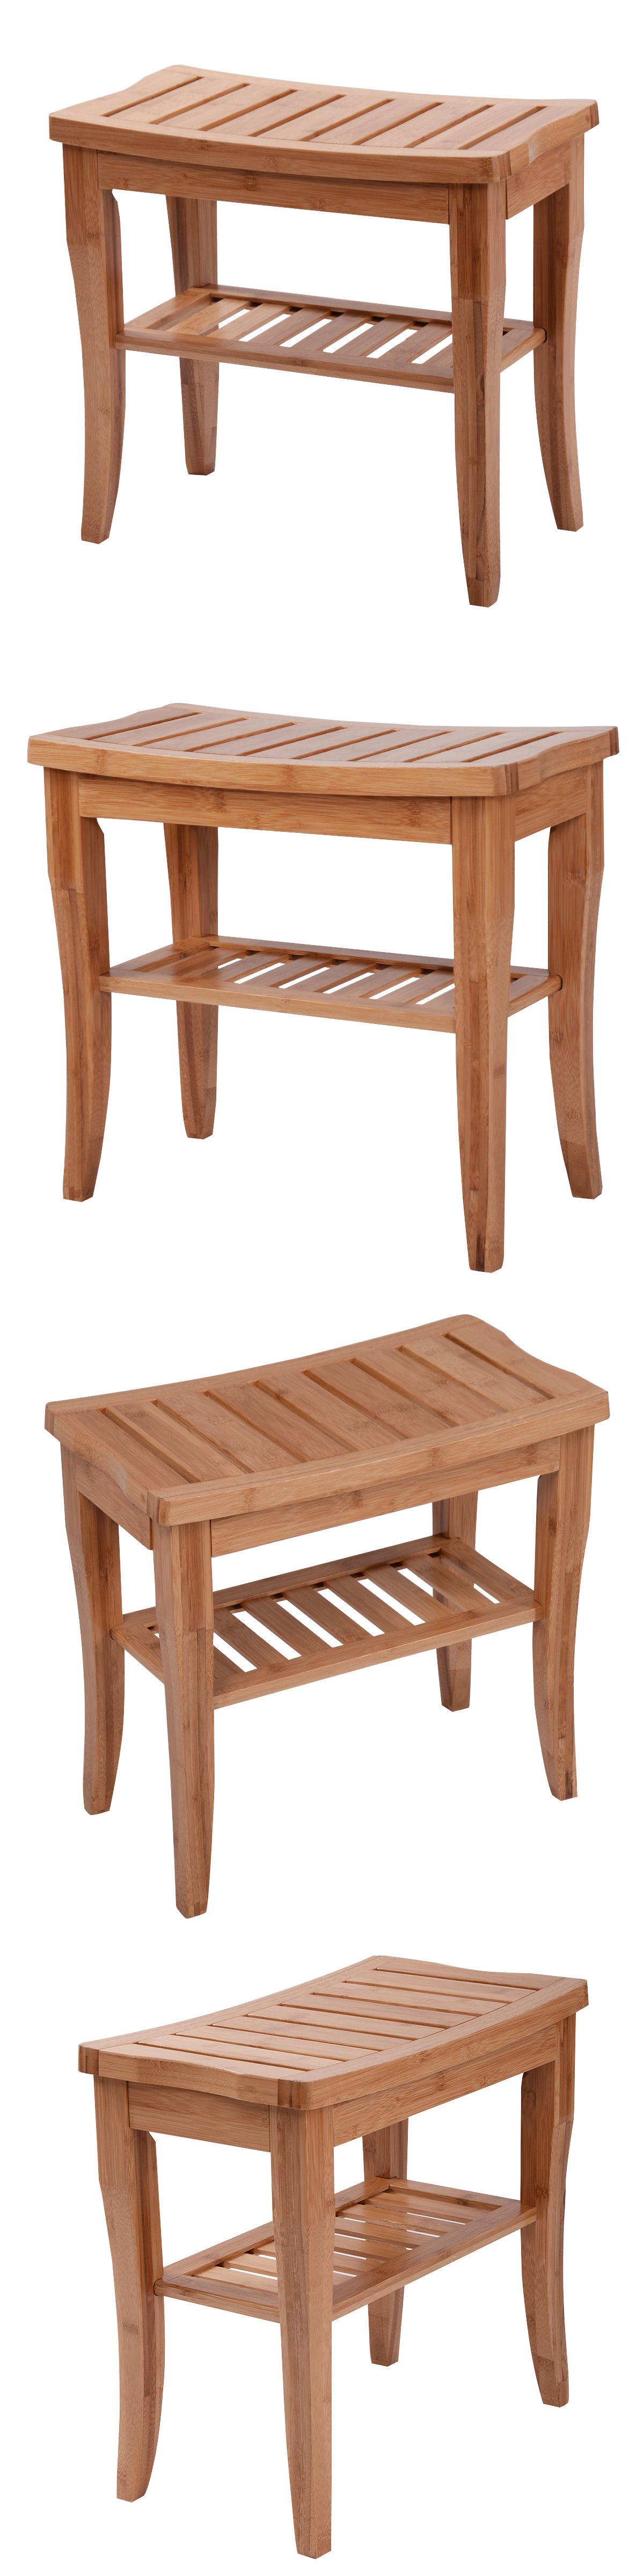 Shower and Bath Seats: Bamboo Shower Seat Bench Bathroom Spa Bath ...